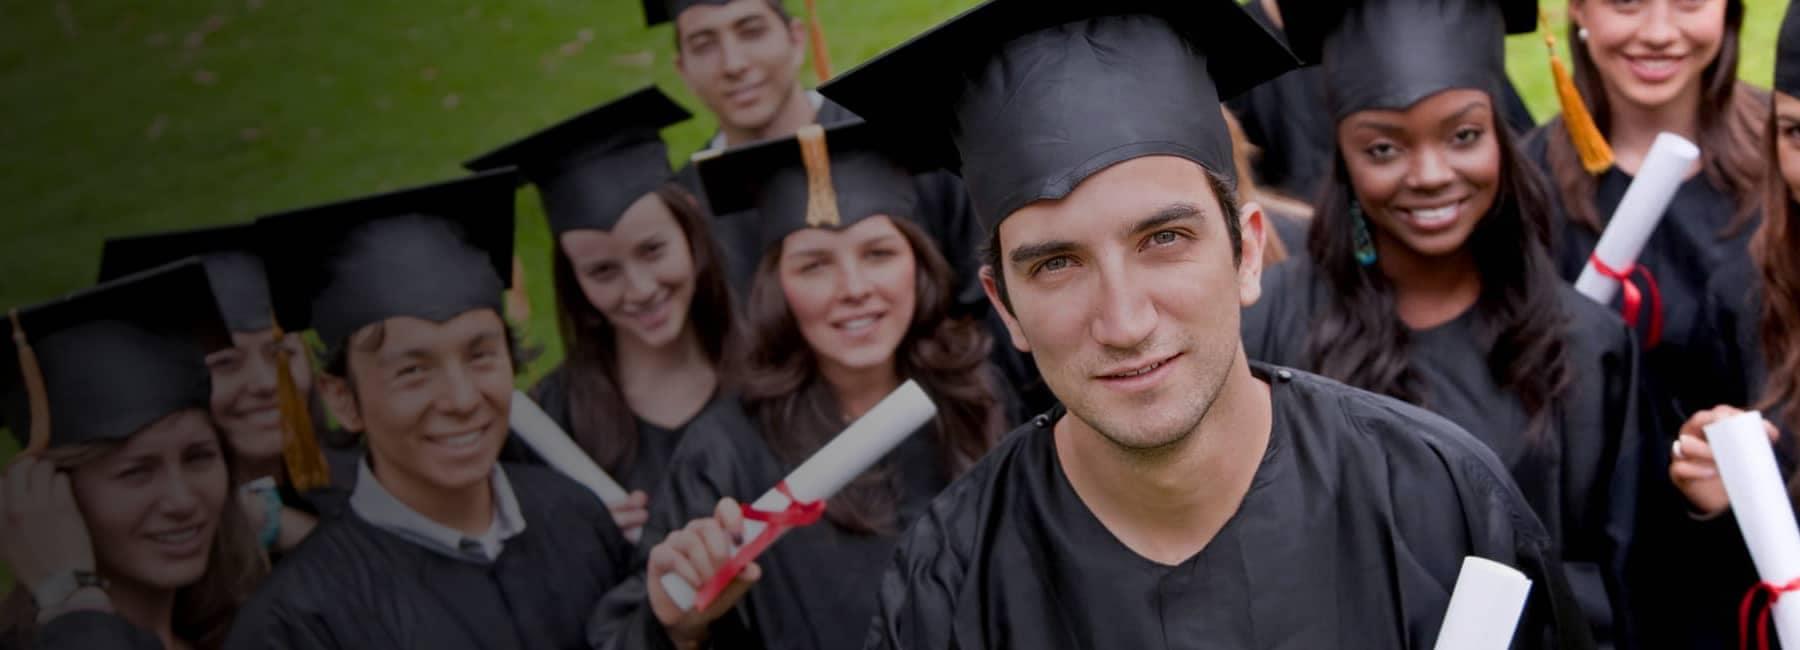 College Graduates with their Diplomas